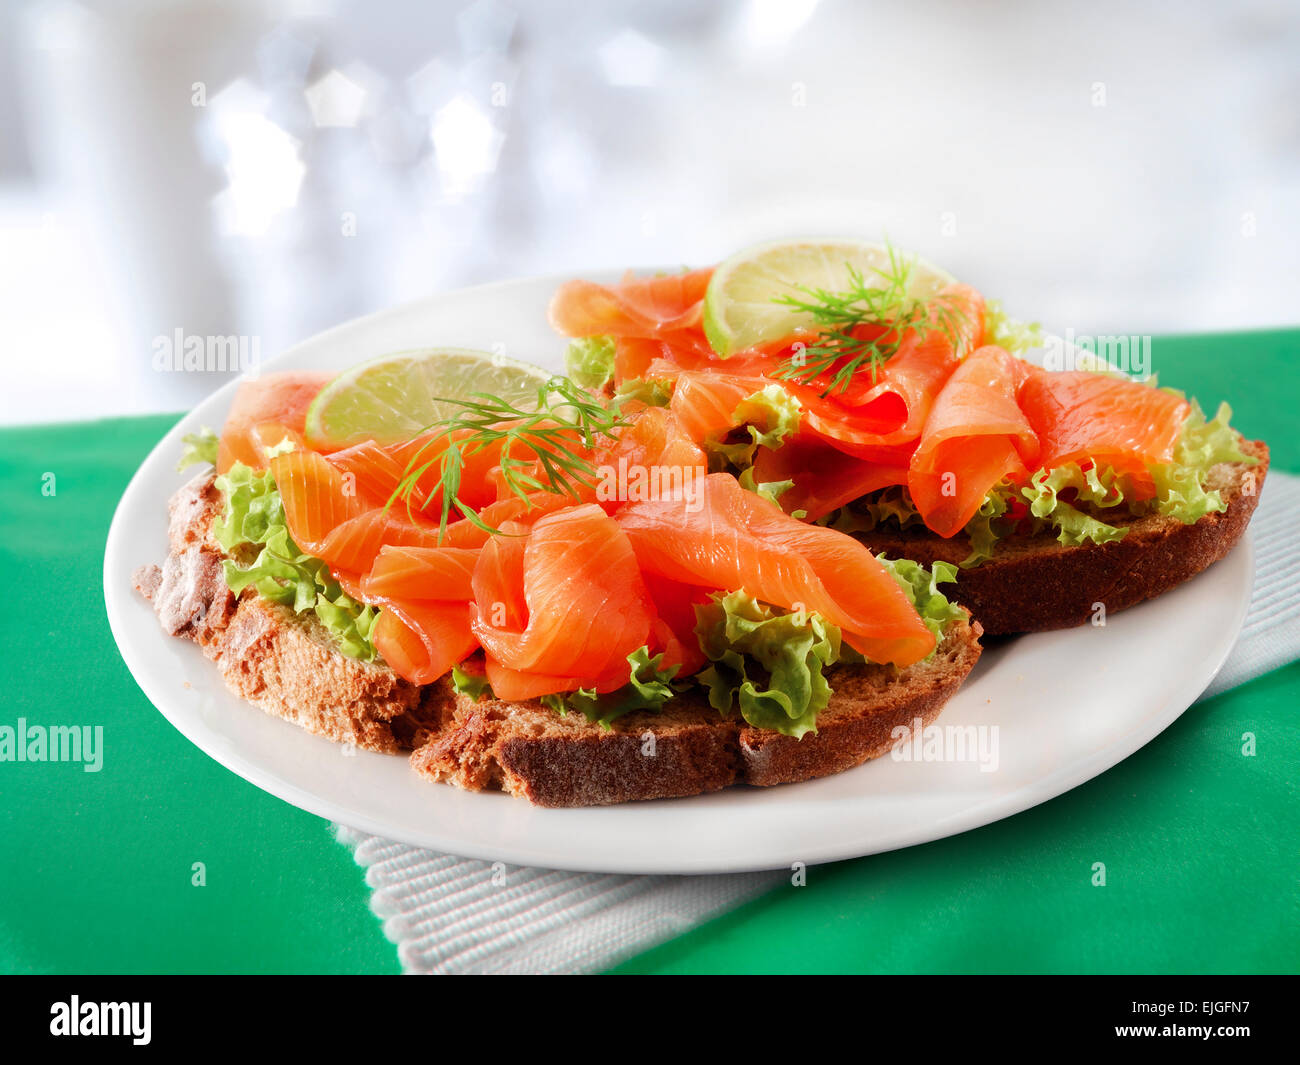 Geräucherter Lachs & Salat Sandwich Stockbild